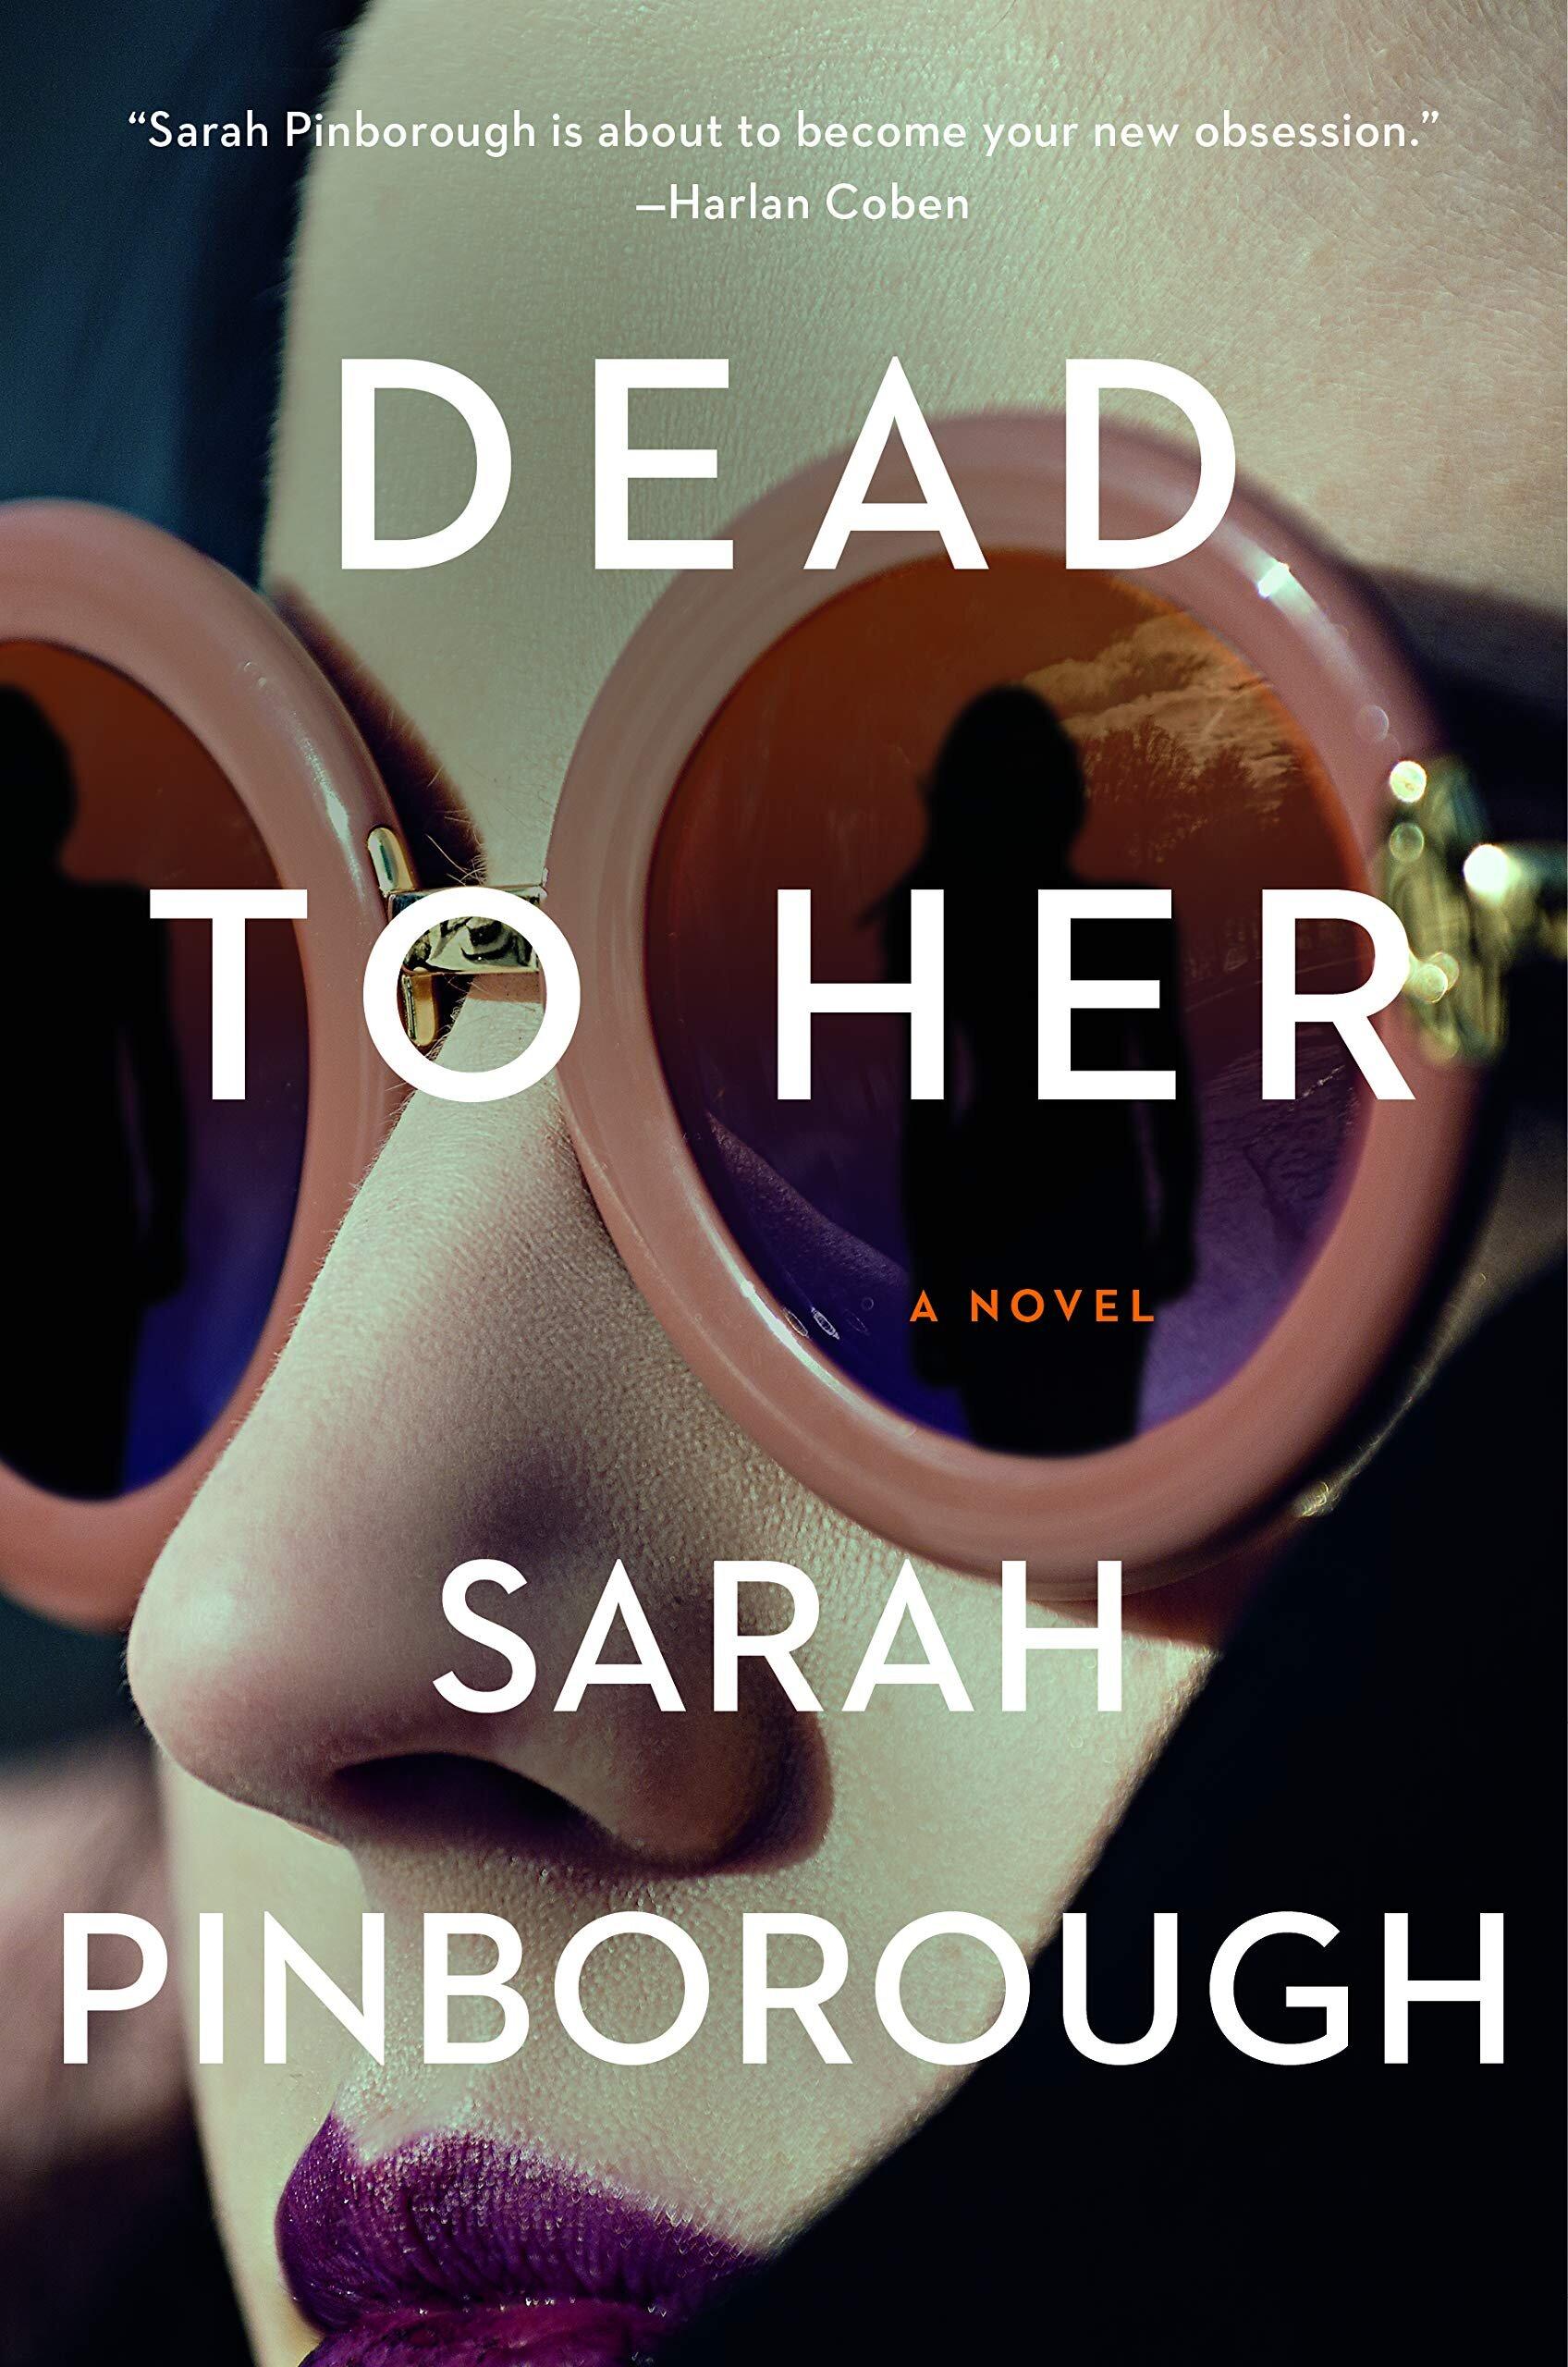 Dead List 2020.2020 Books On My Tbr List Tbr Mix And Mingle December